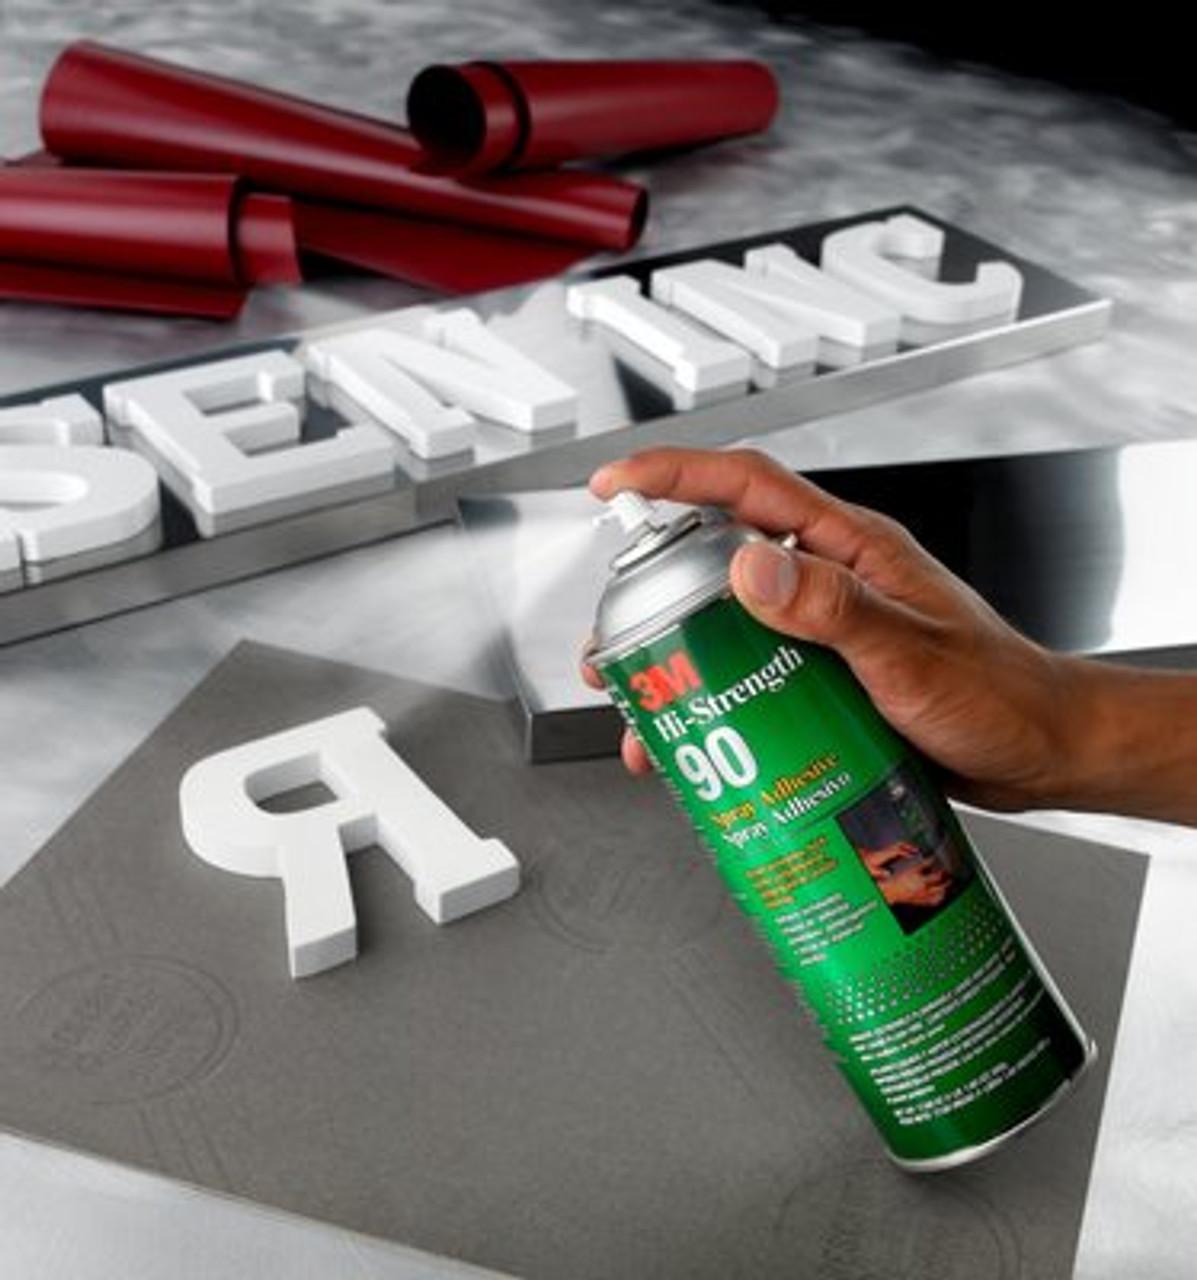 3M™ Hi-Strength 90 Cylinder Spray Adhesive, Clear, Intermediate Cylinder (Net Wt 141.6 lb)